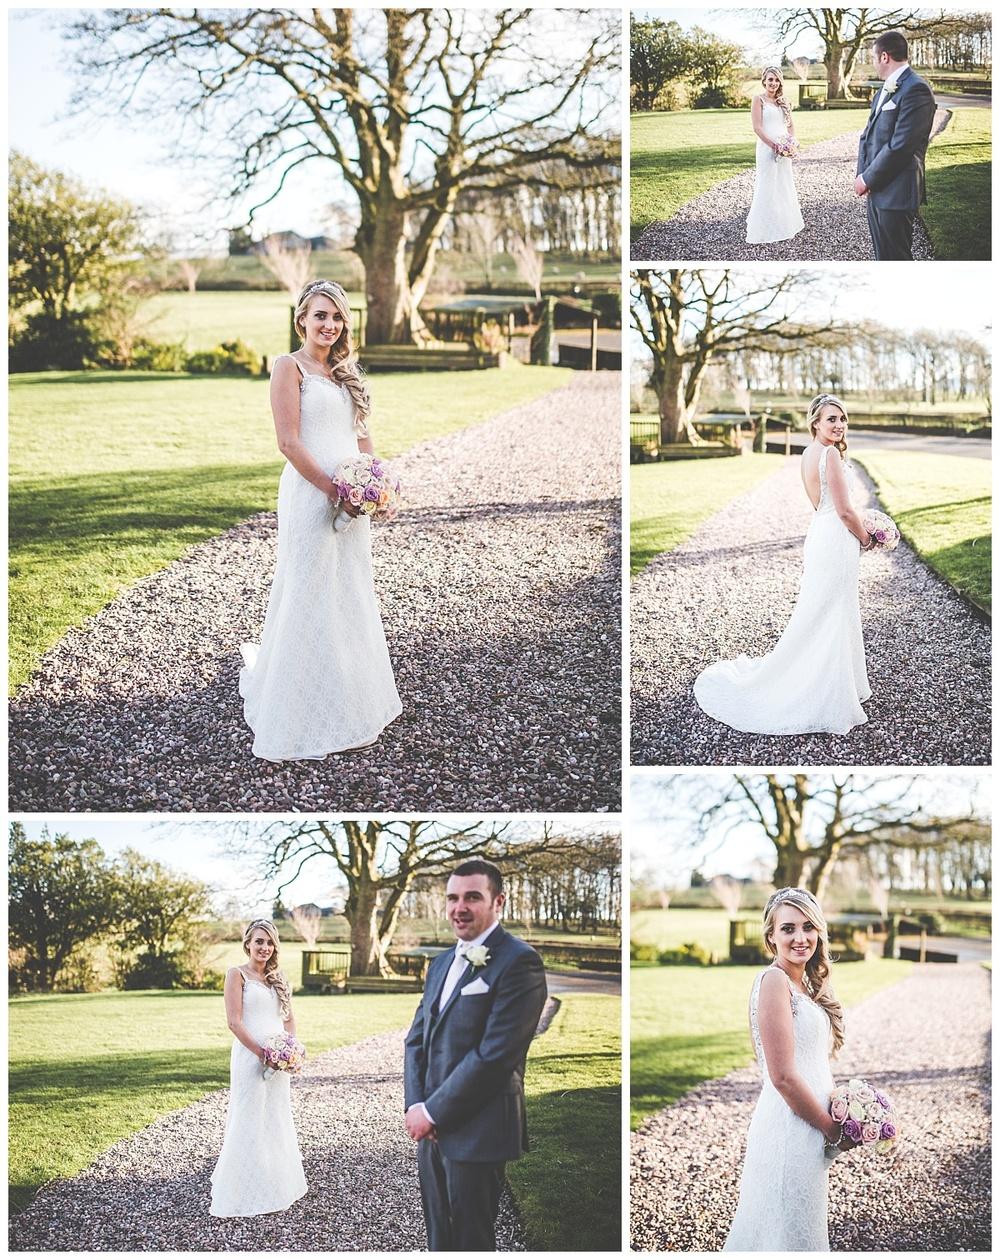 Stirk House Hotel Wedding - Ribble Valley Manchester Wedding Photographer (26)